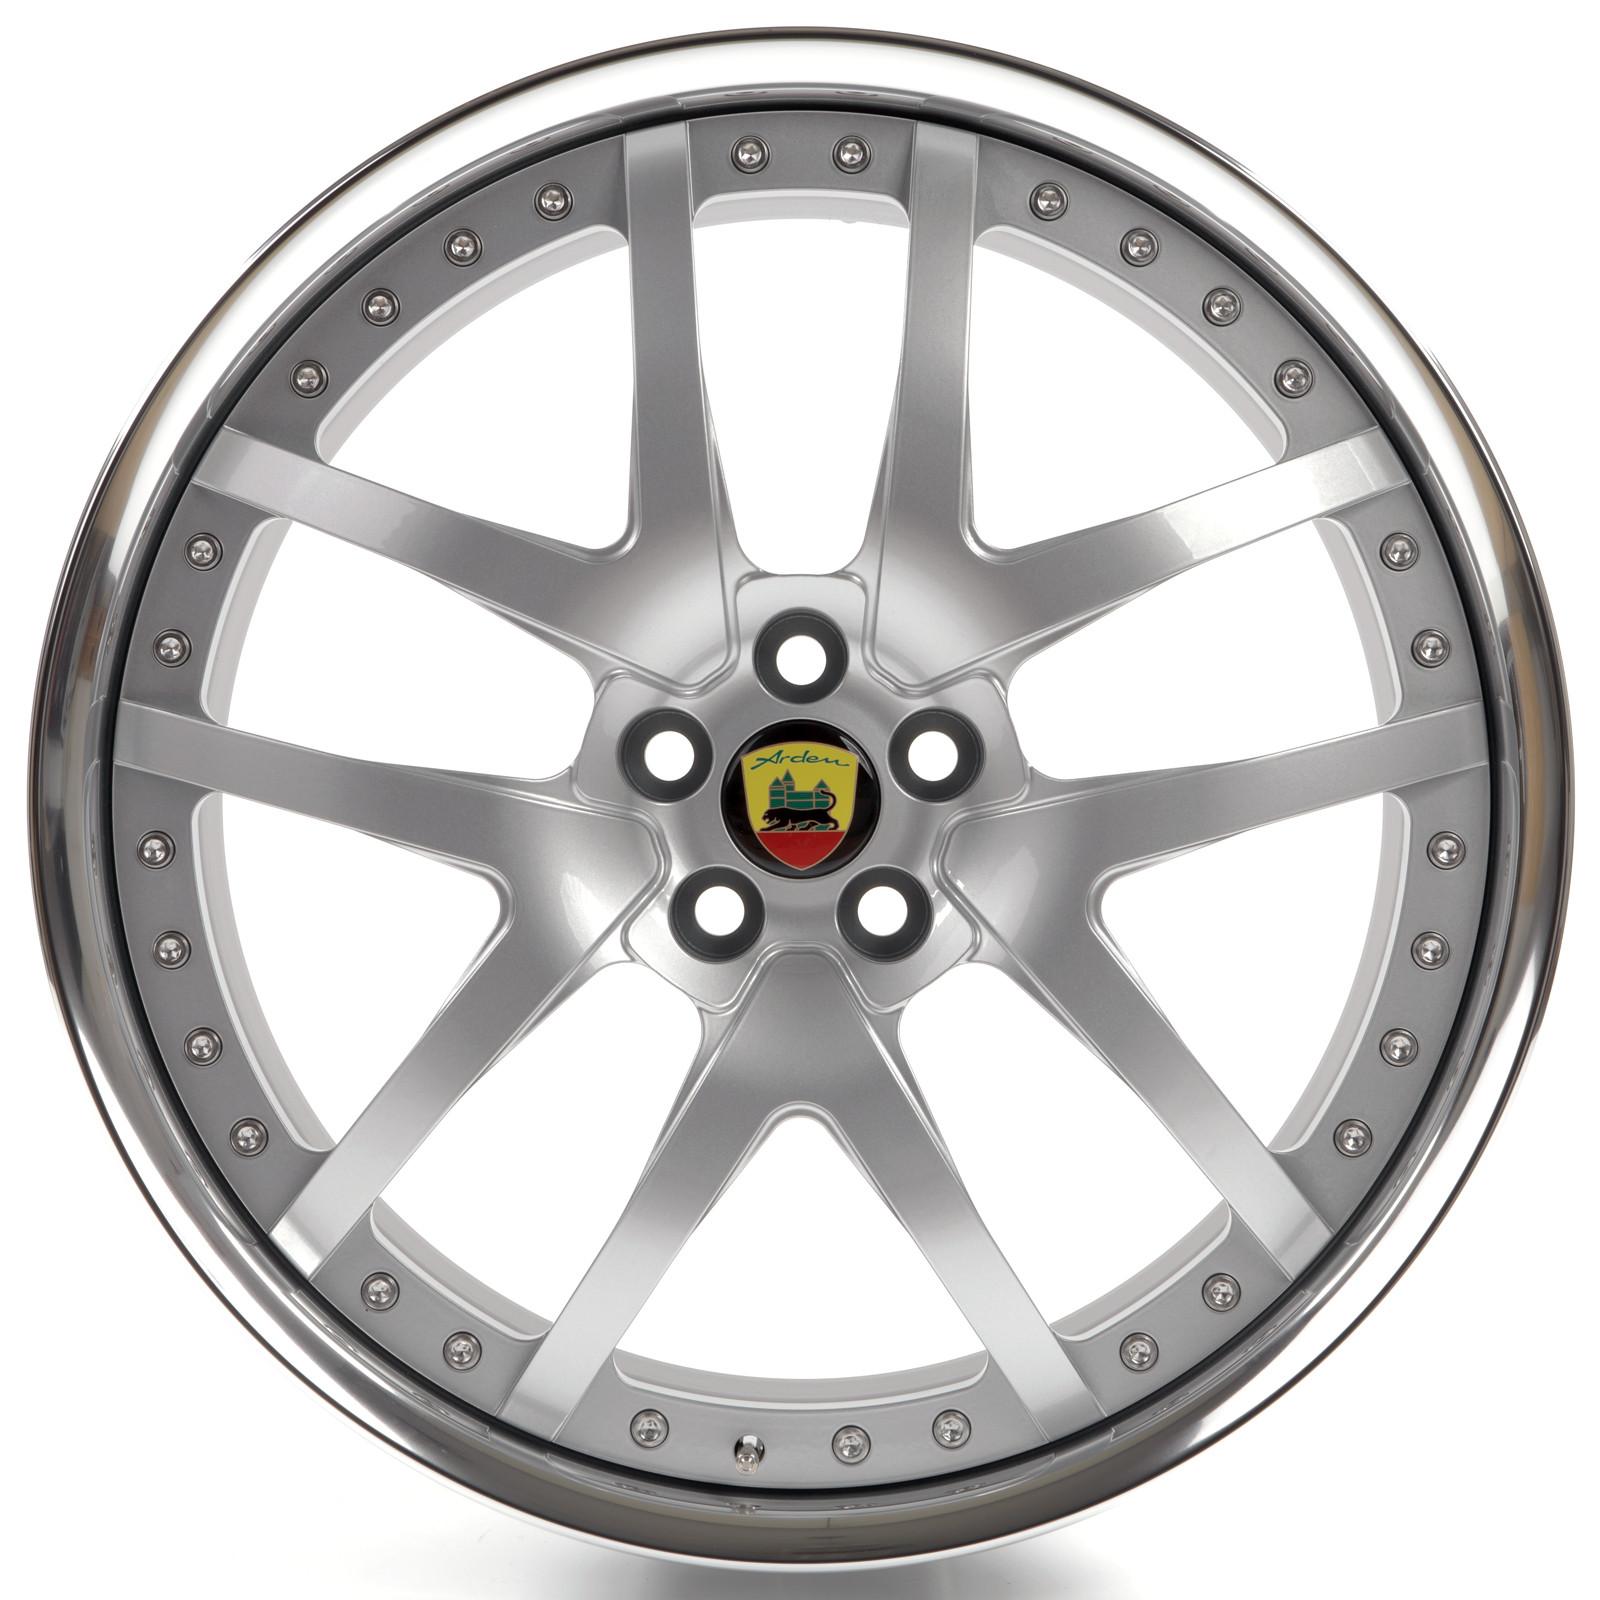 "Arden Sportline Forged Wheel in 10x22"""